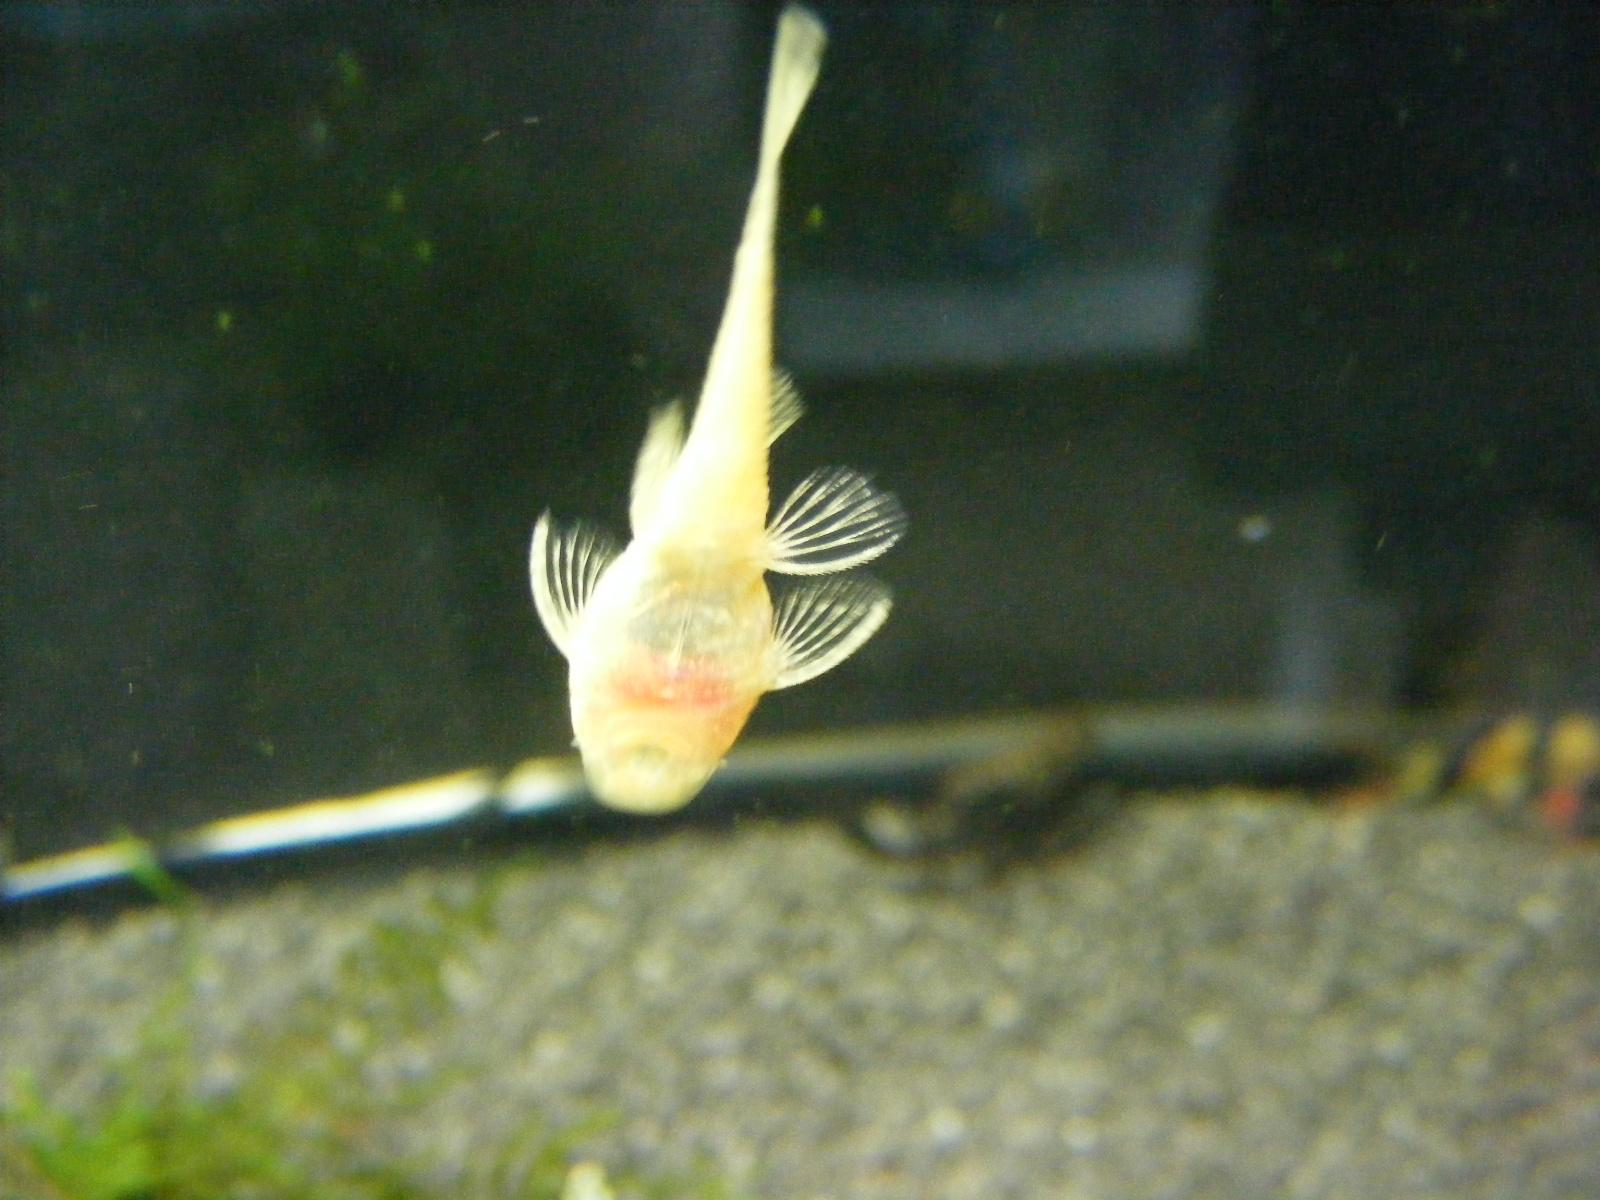 Spiksplinternieuw Ancistrus albino 3 cm - Pecesdeacuarios OF-86